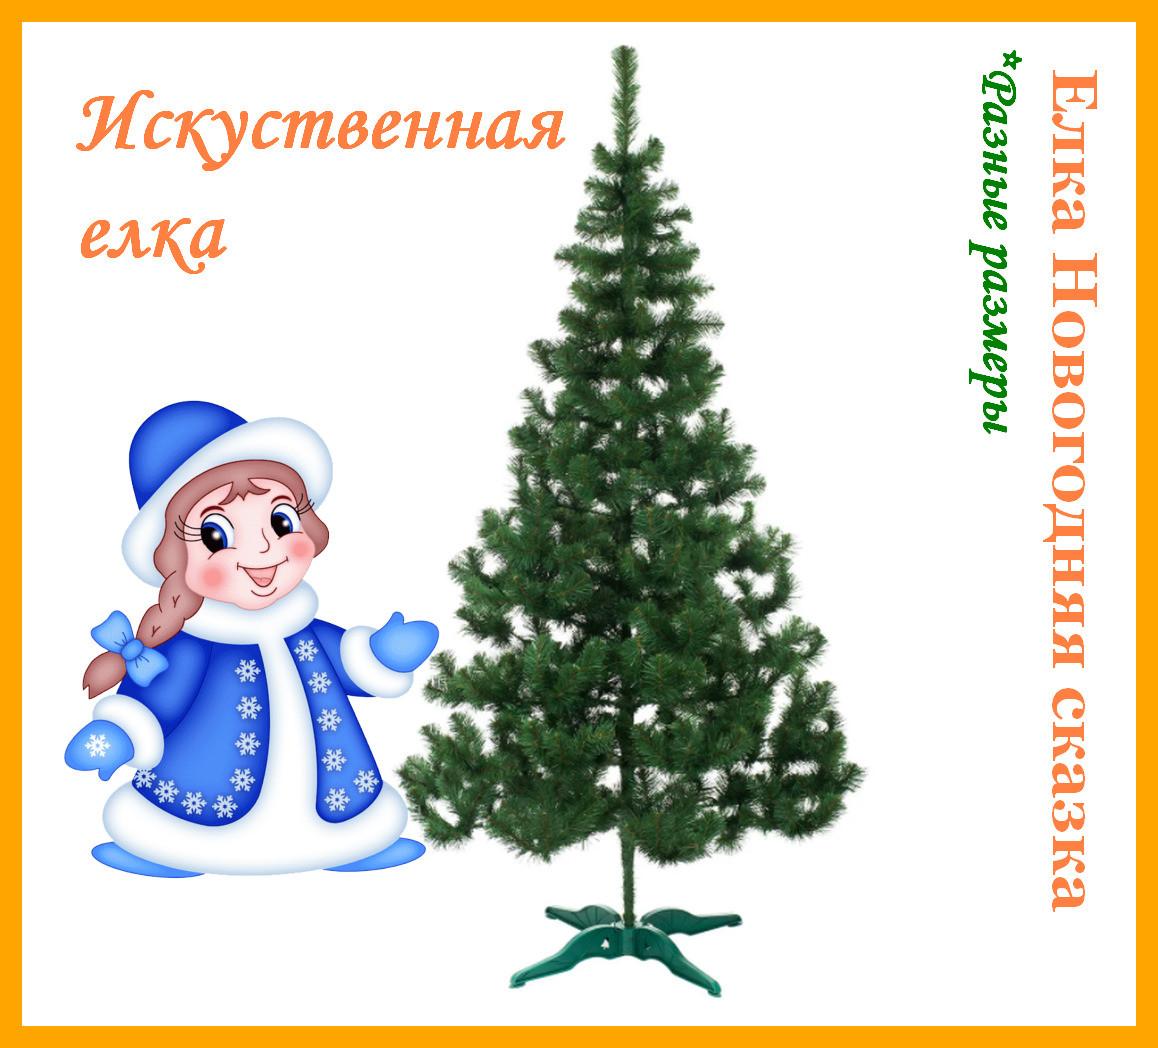 ЕЛЬ штучне ПВХ 2,5 м Штучна ЯЛИНКА новорічна КАЗКА 2.5 метра Ялинка новорічна 250см